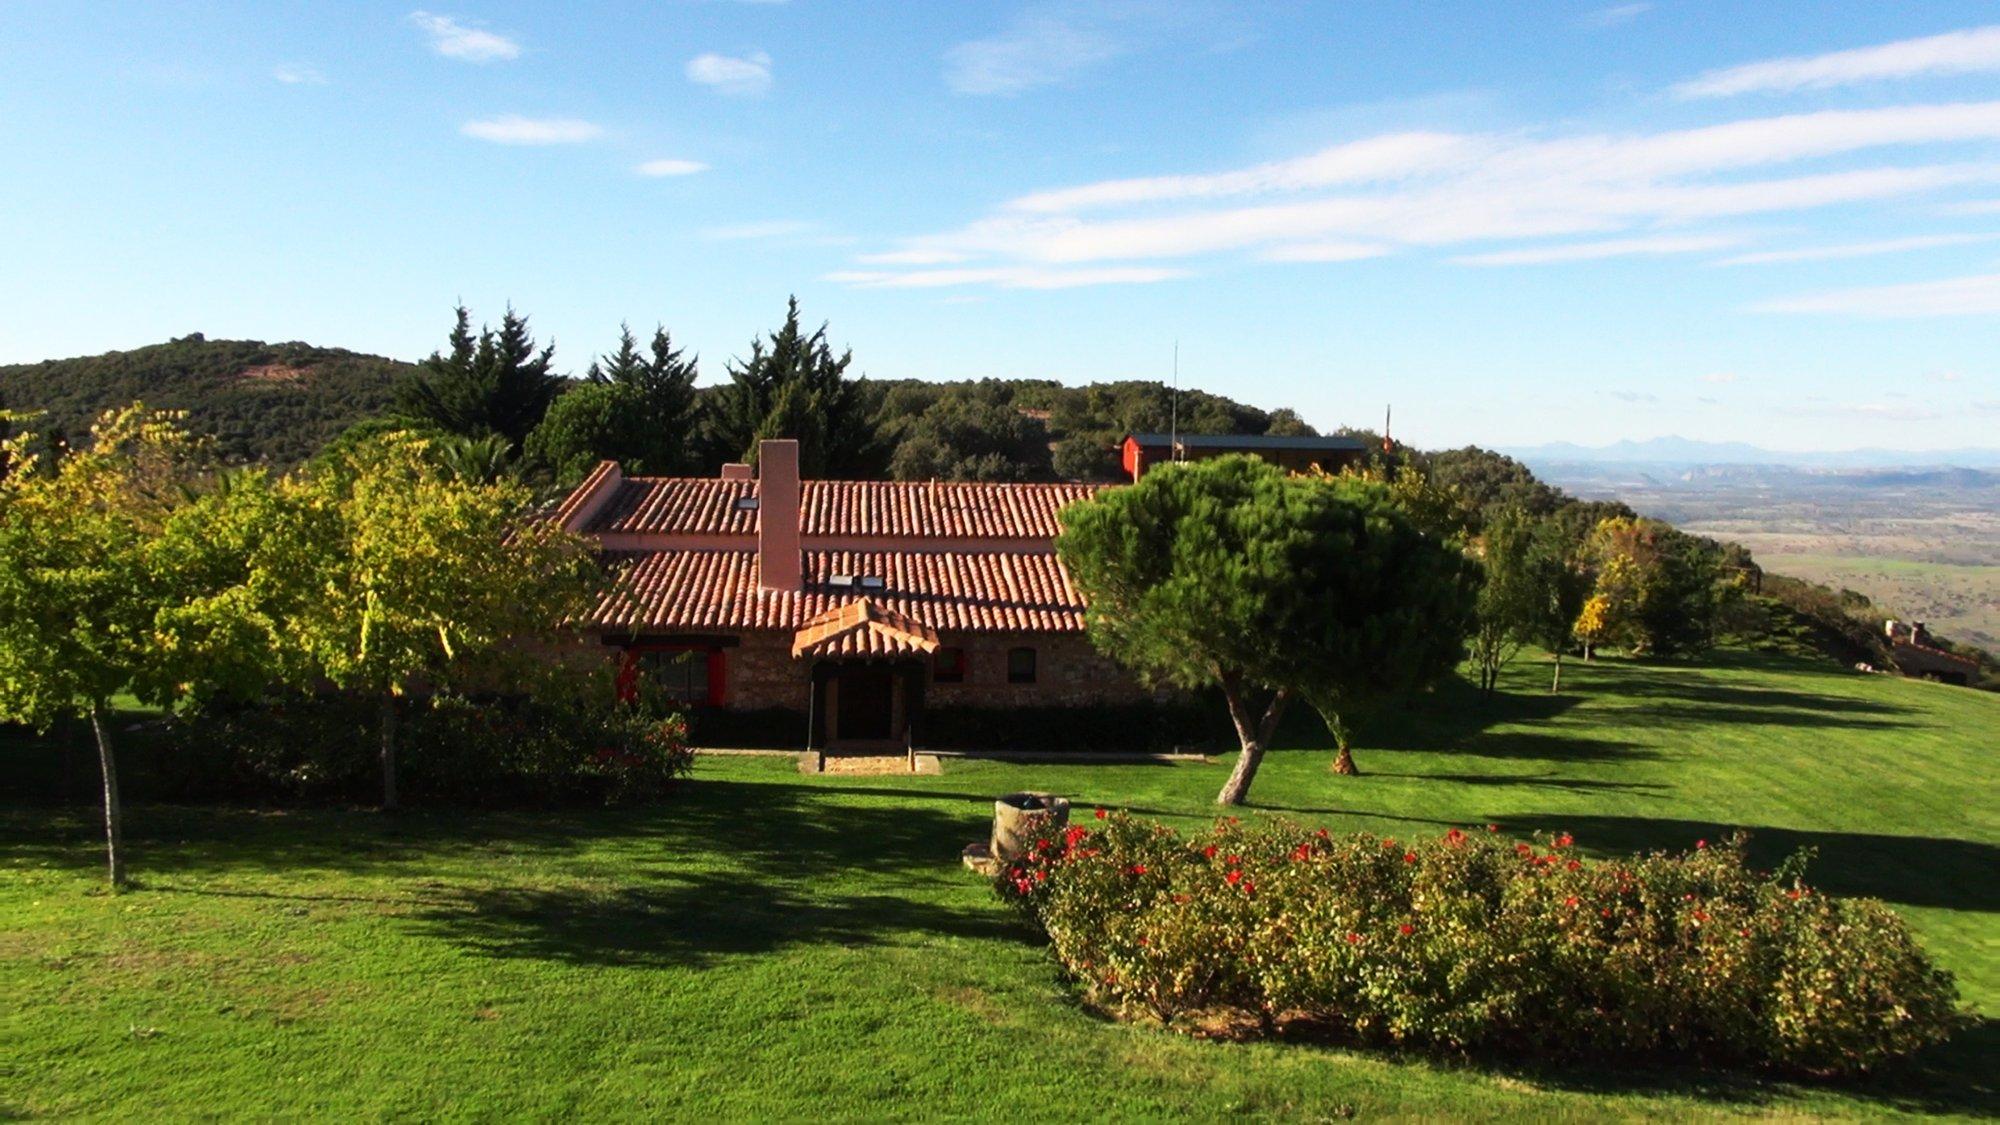 Badajoz, Extremadura, Spain 1